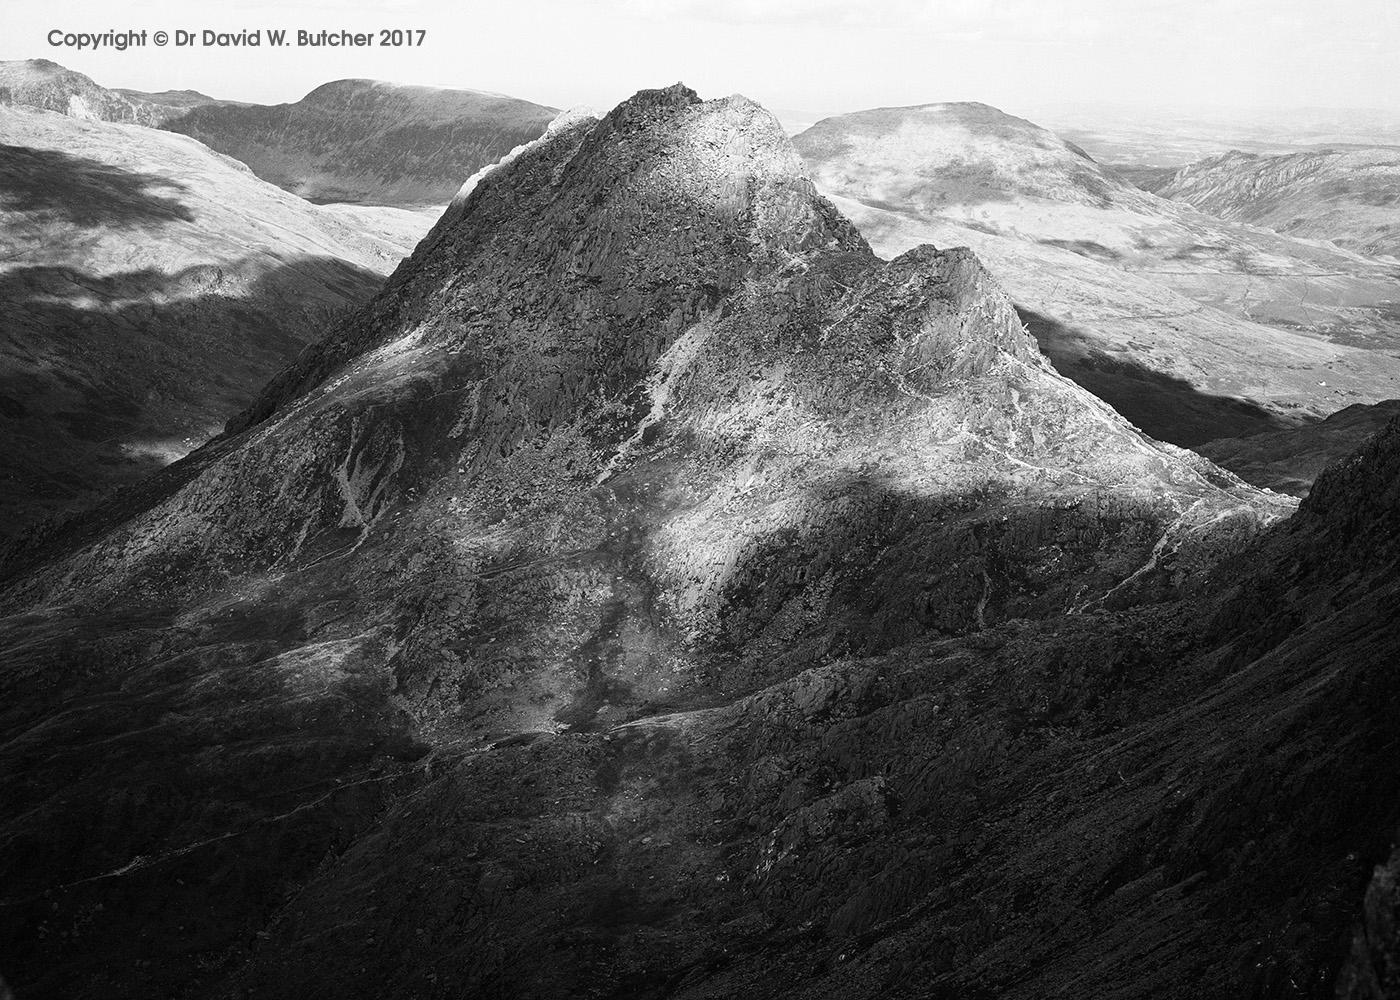 Tryfan from Glyder Fach, Bethesda, Snowdonia, Wales